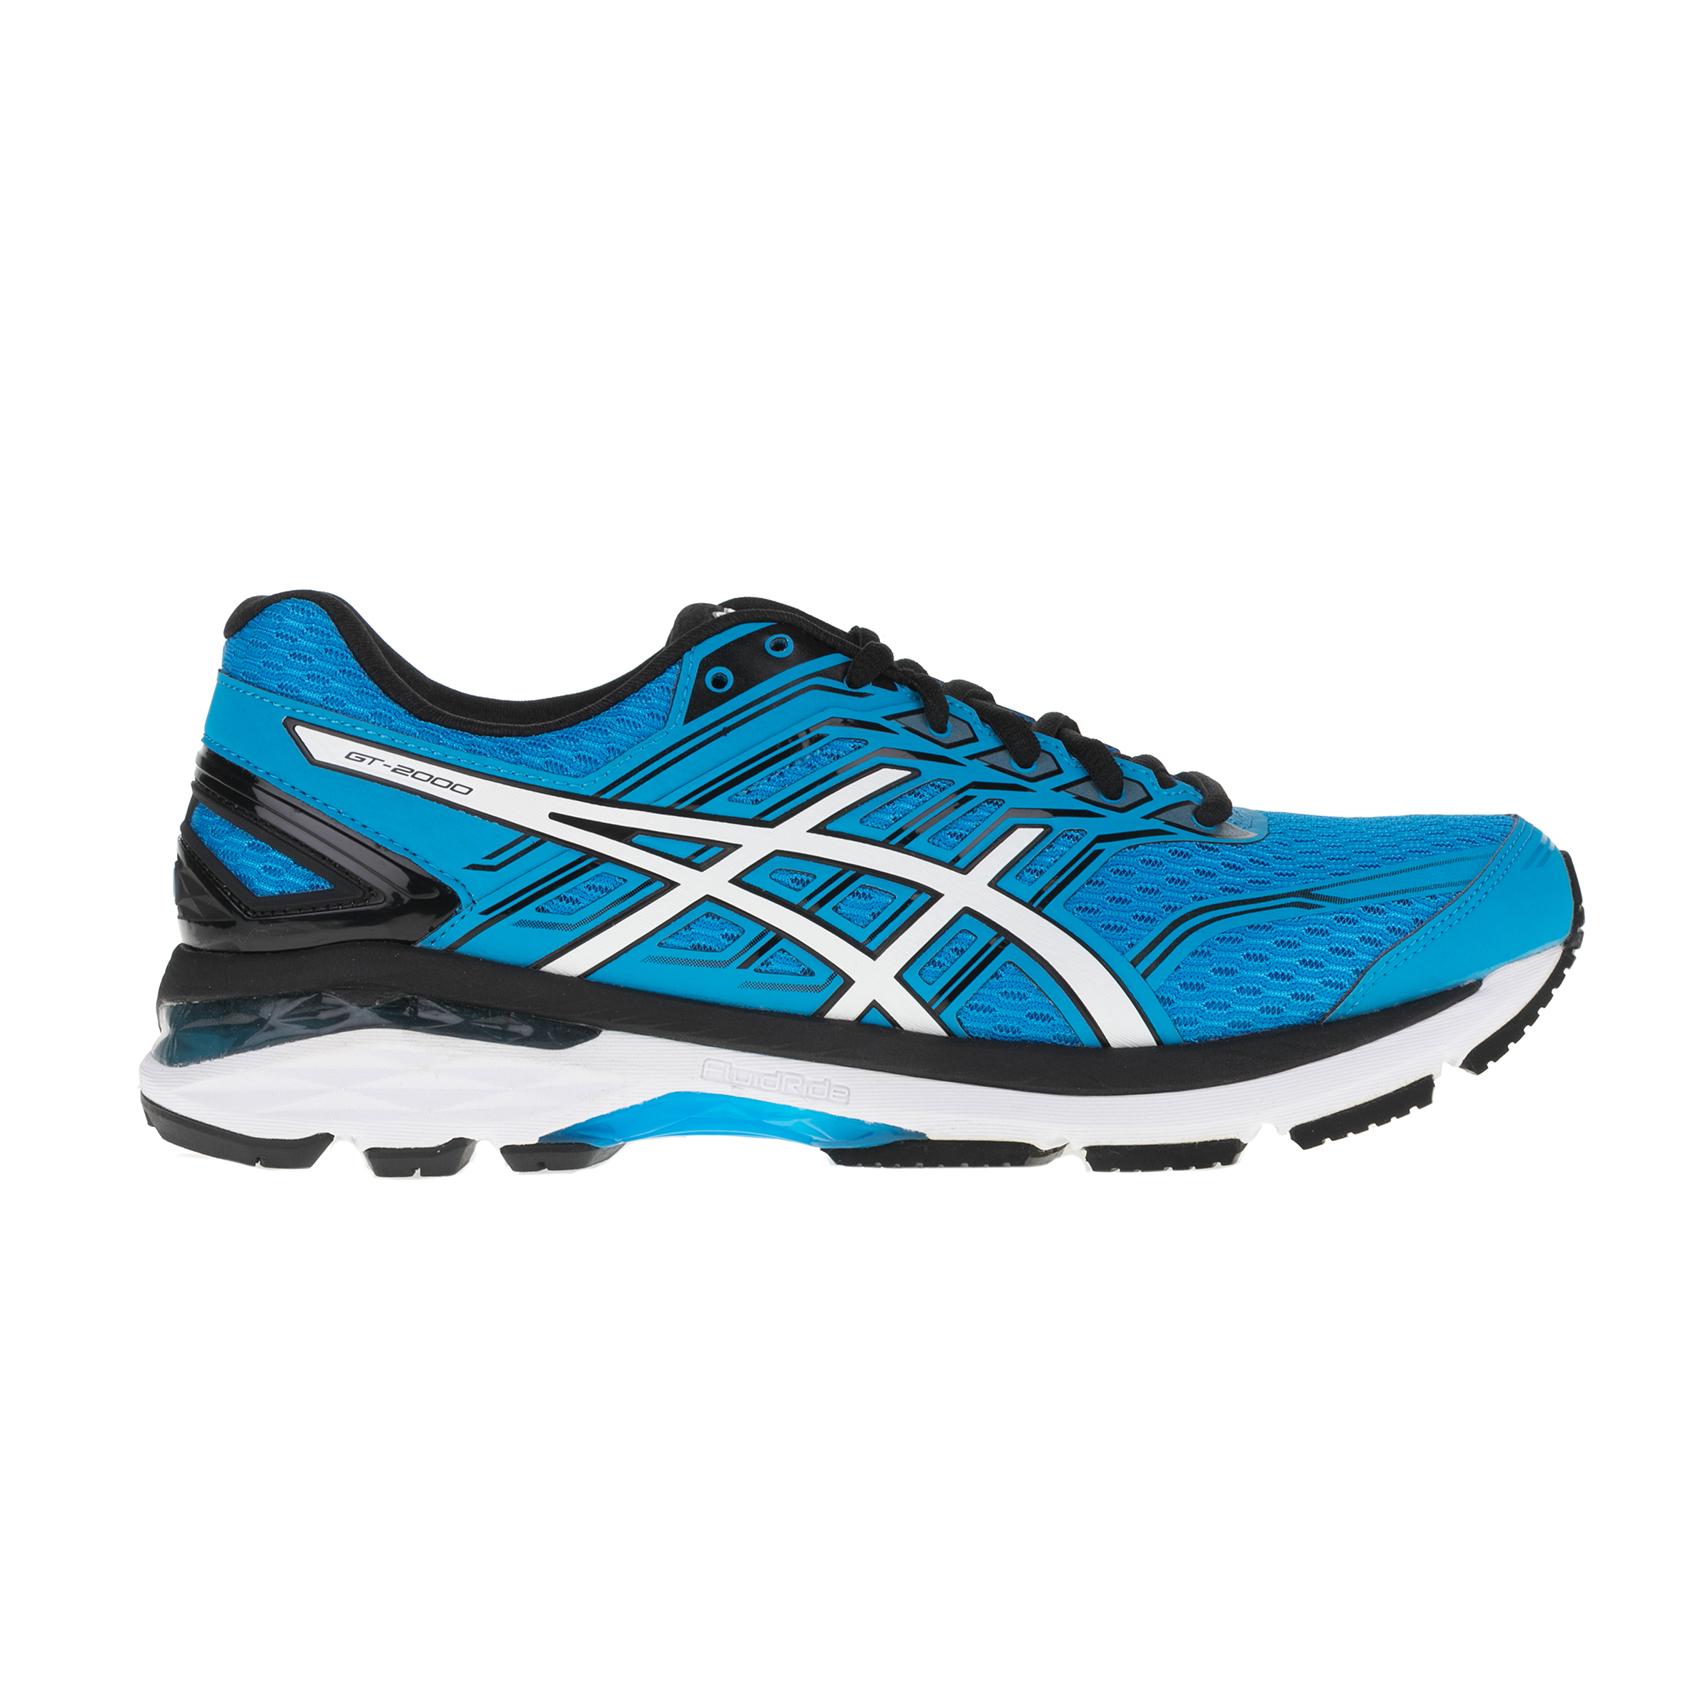 ASICS – Ανδρικά παπούτσια ASICS GT-2000 5 μπλε